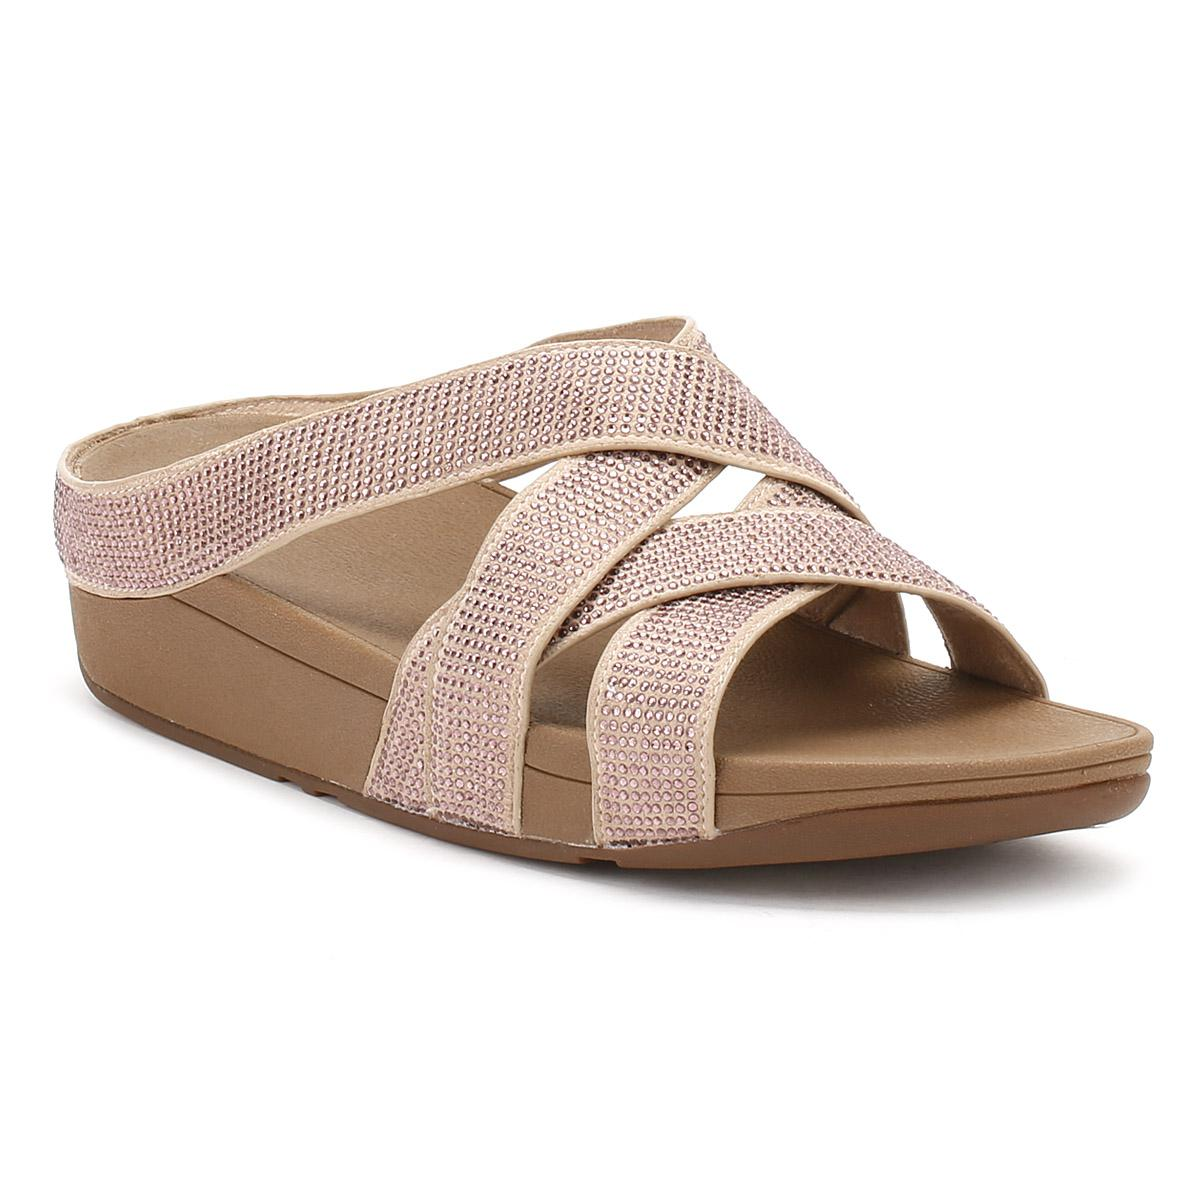 d29e980b6 Lyst - Fitflop Womens Nude Slinky Rokkit Criss-cross Sandals